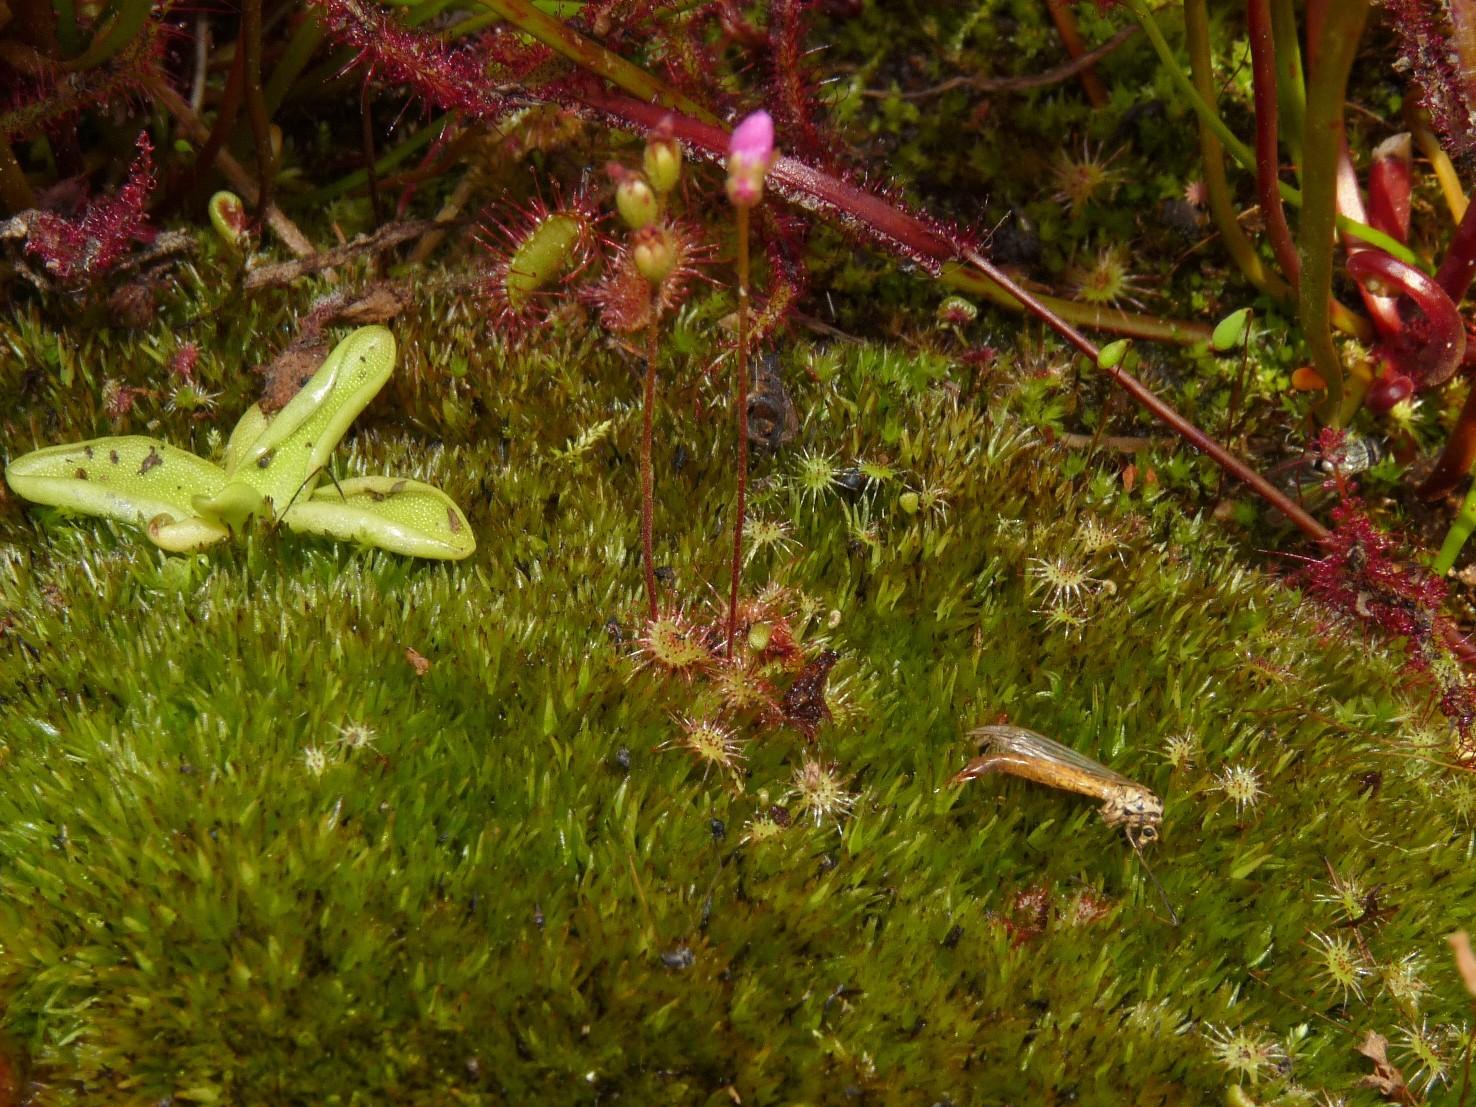 Donica na działce 2017 - Pinguicula vulgaris i Drosera rotundifolia